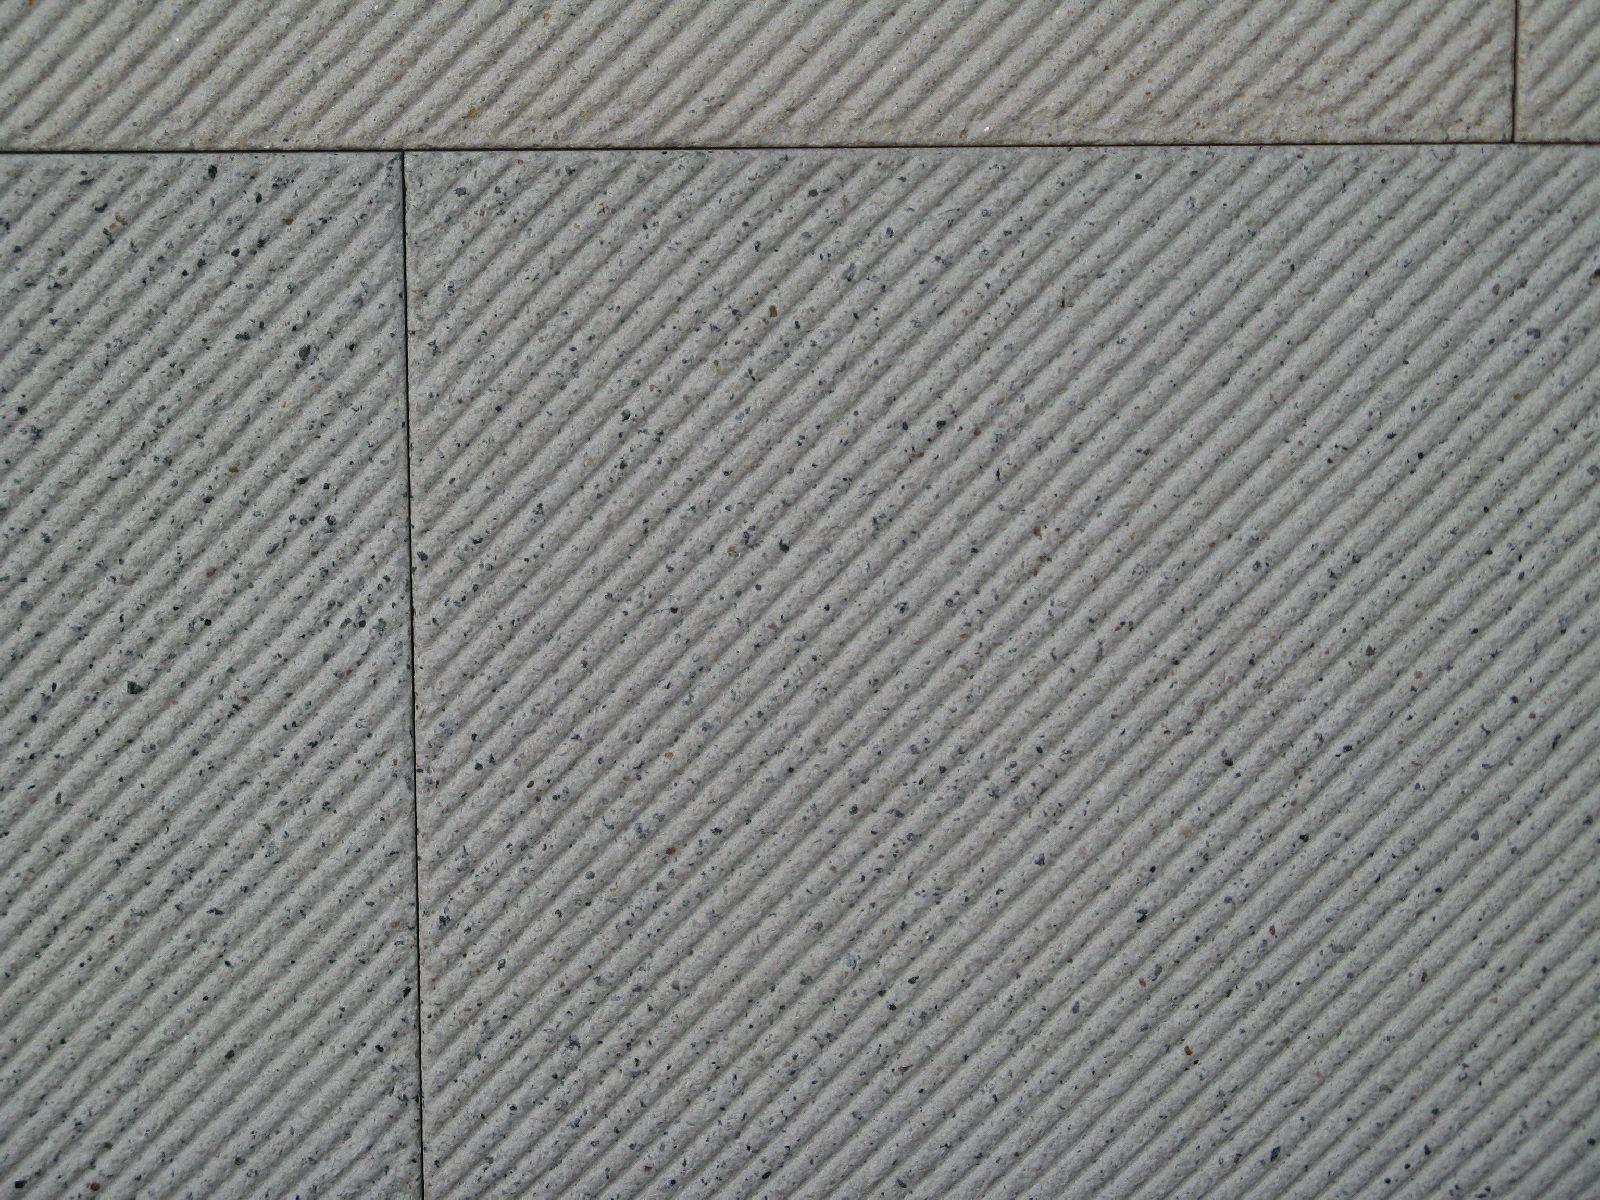 Stone_Texture_B_2953